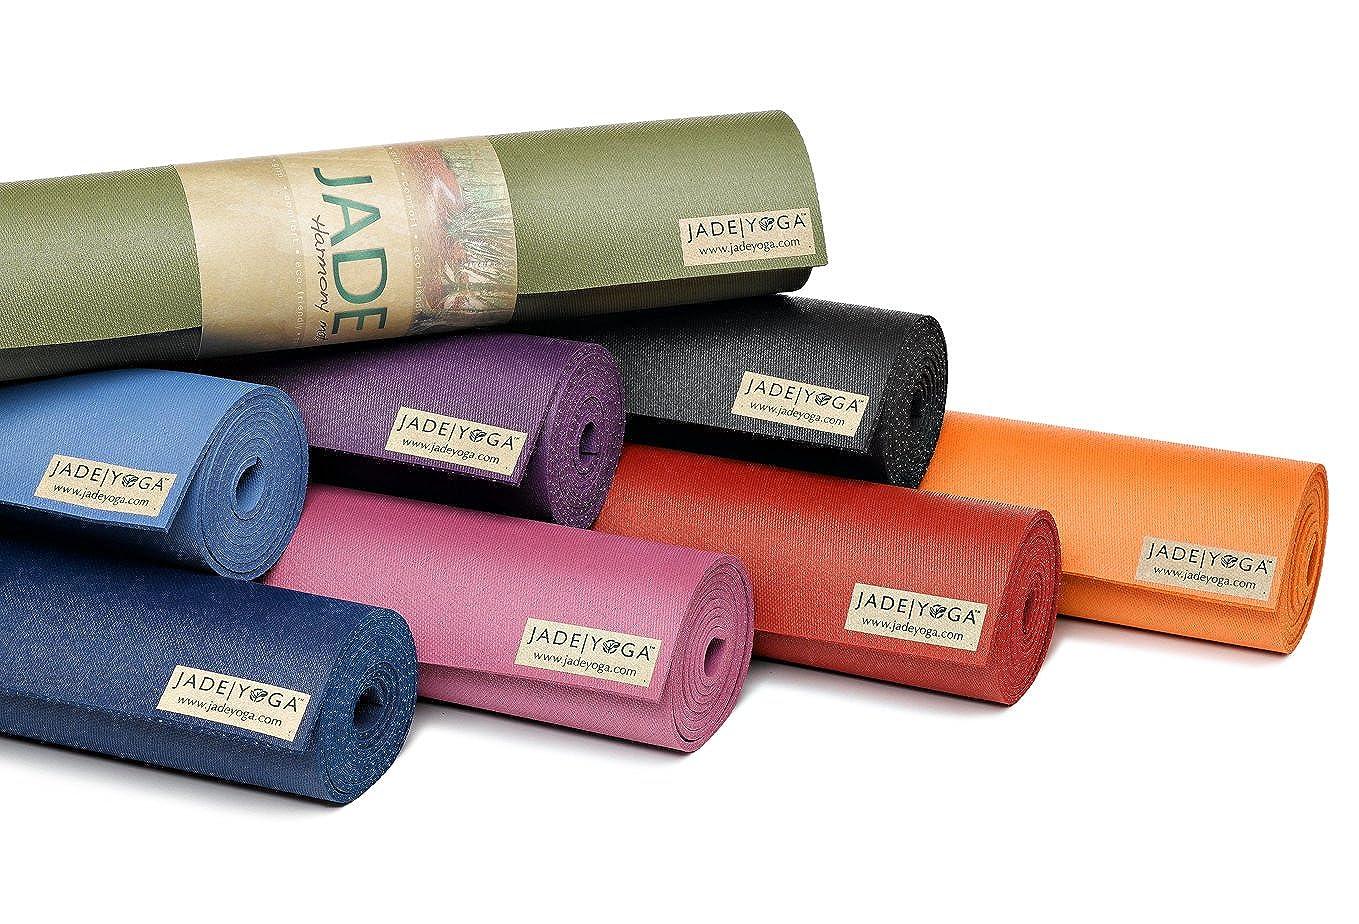 Jade Yoga Travel Mat-Purple-3mm x 173cm: Amazon.es: Electrónica